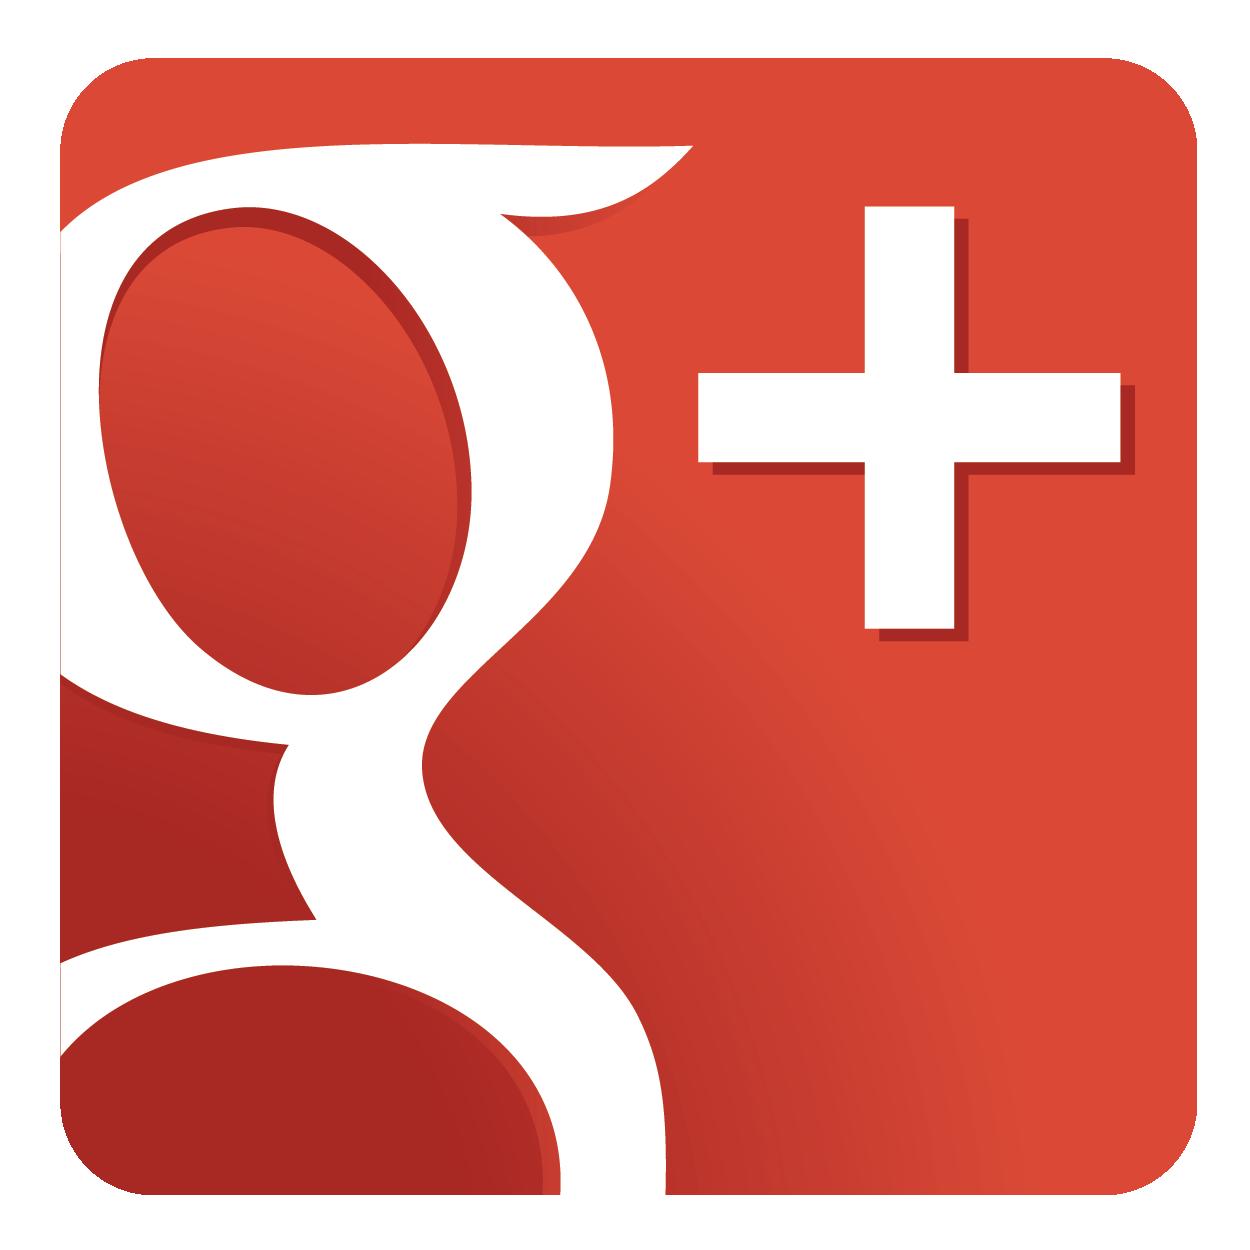 http://www.johnkamal.com/wp-content/uploads/2012/12/Google-Plus-Logo.png